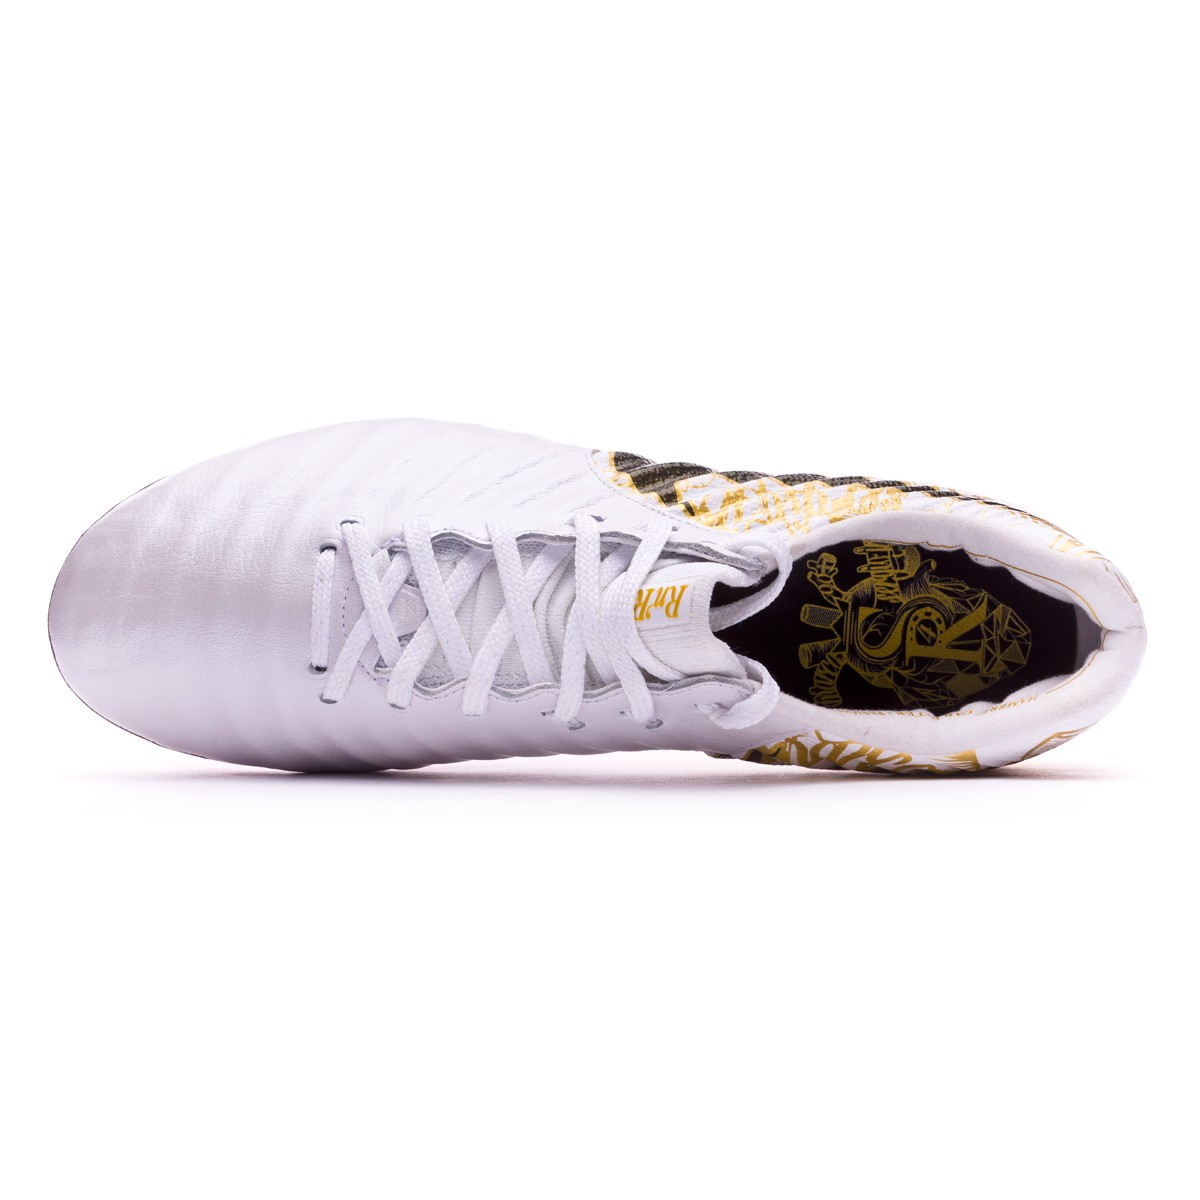 a80d95342cee Football Boots Nike Tiempo Legend VII SR4 FG White-Vivid gold - Football  store Fútbol Emotion